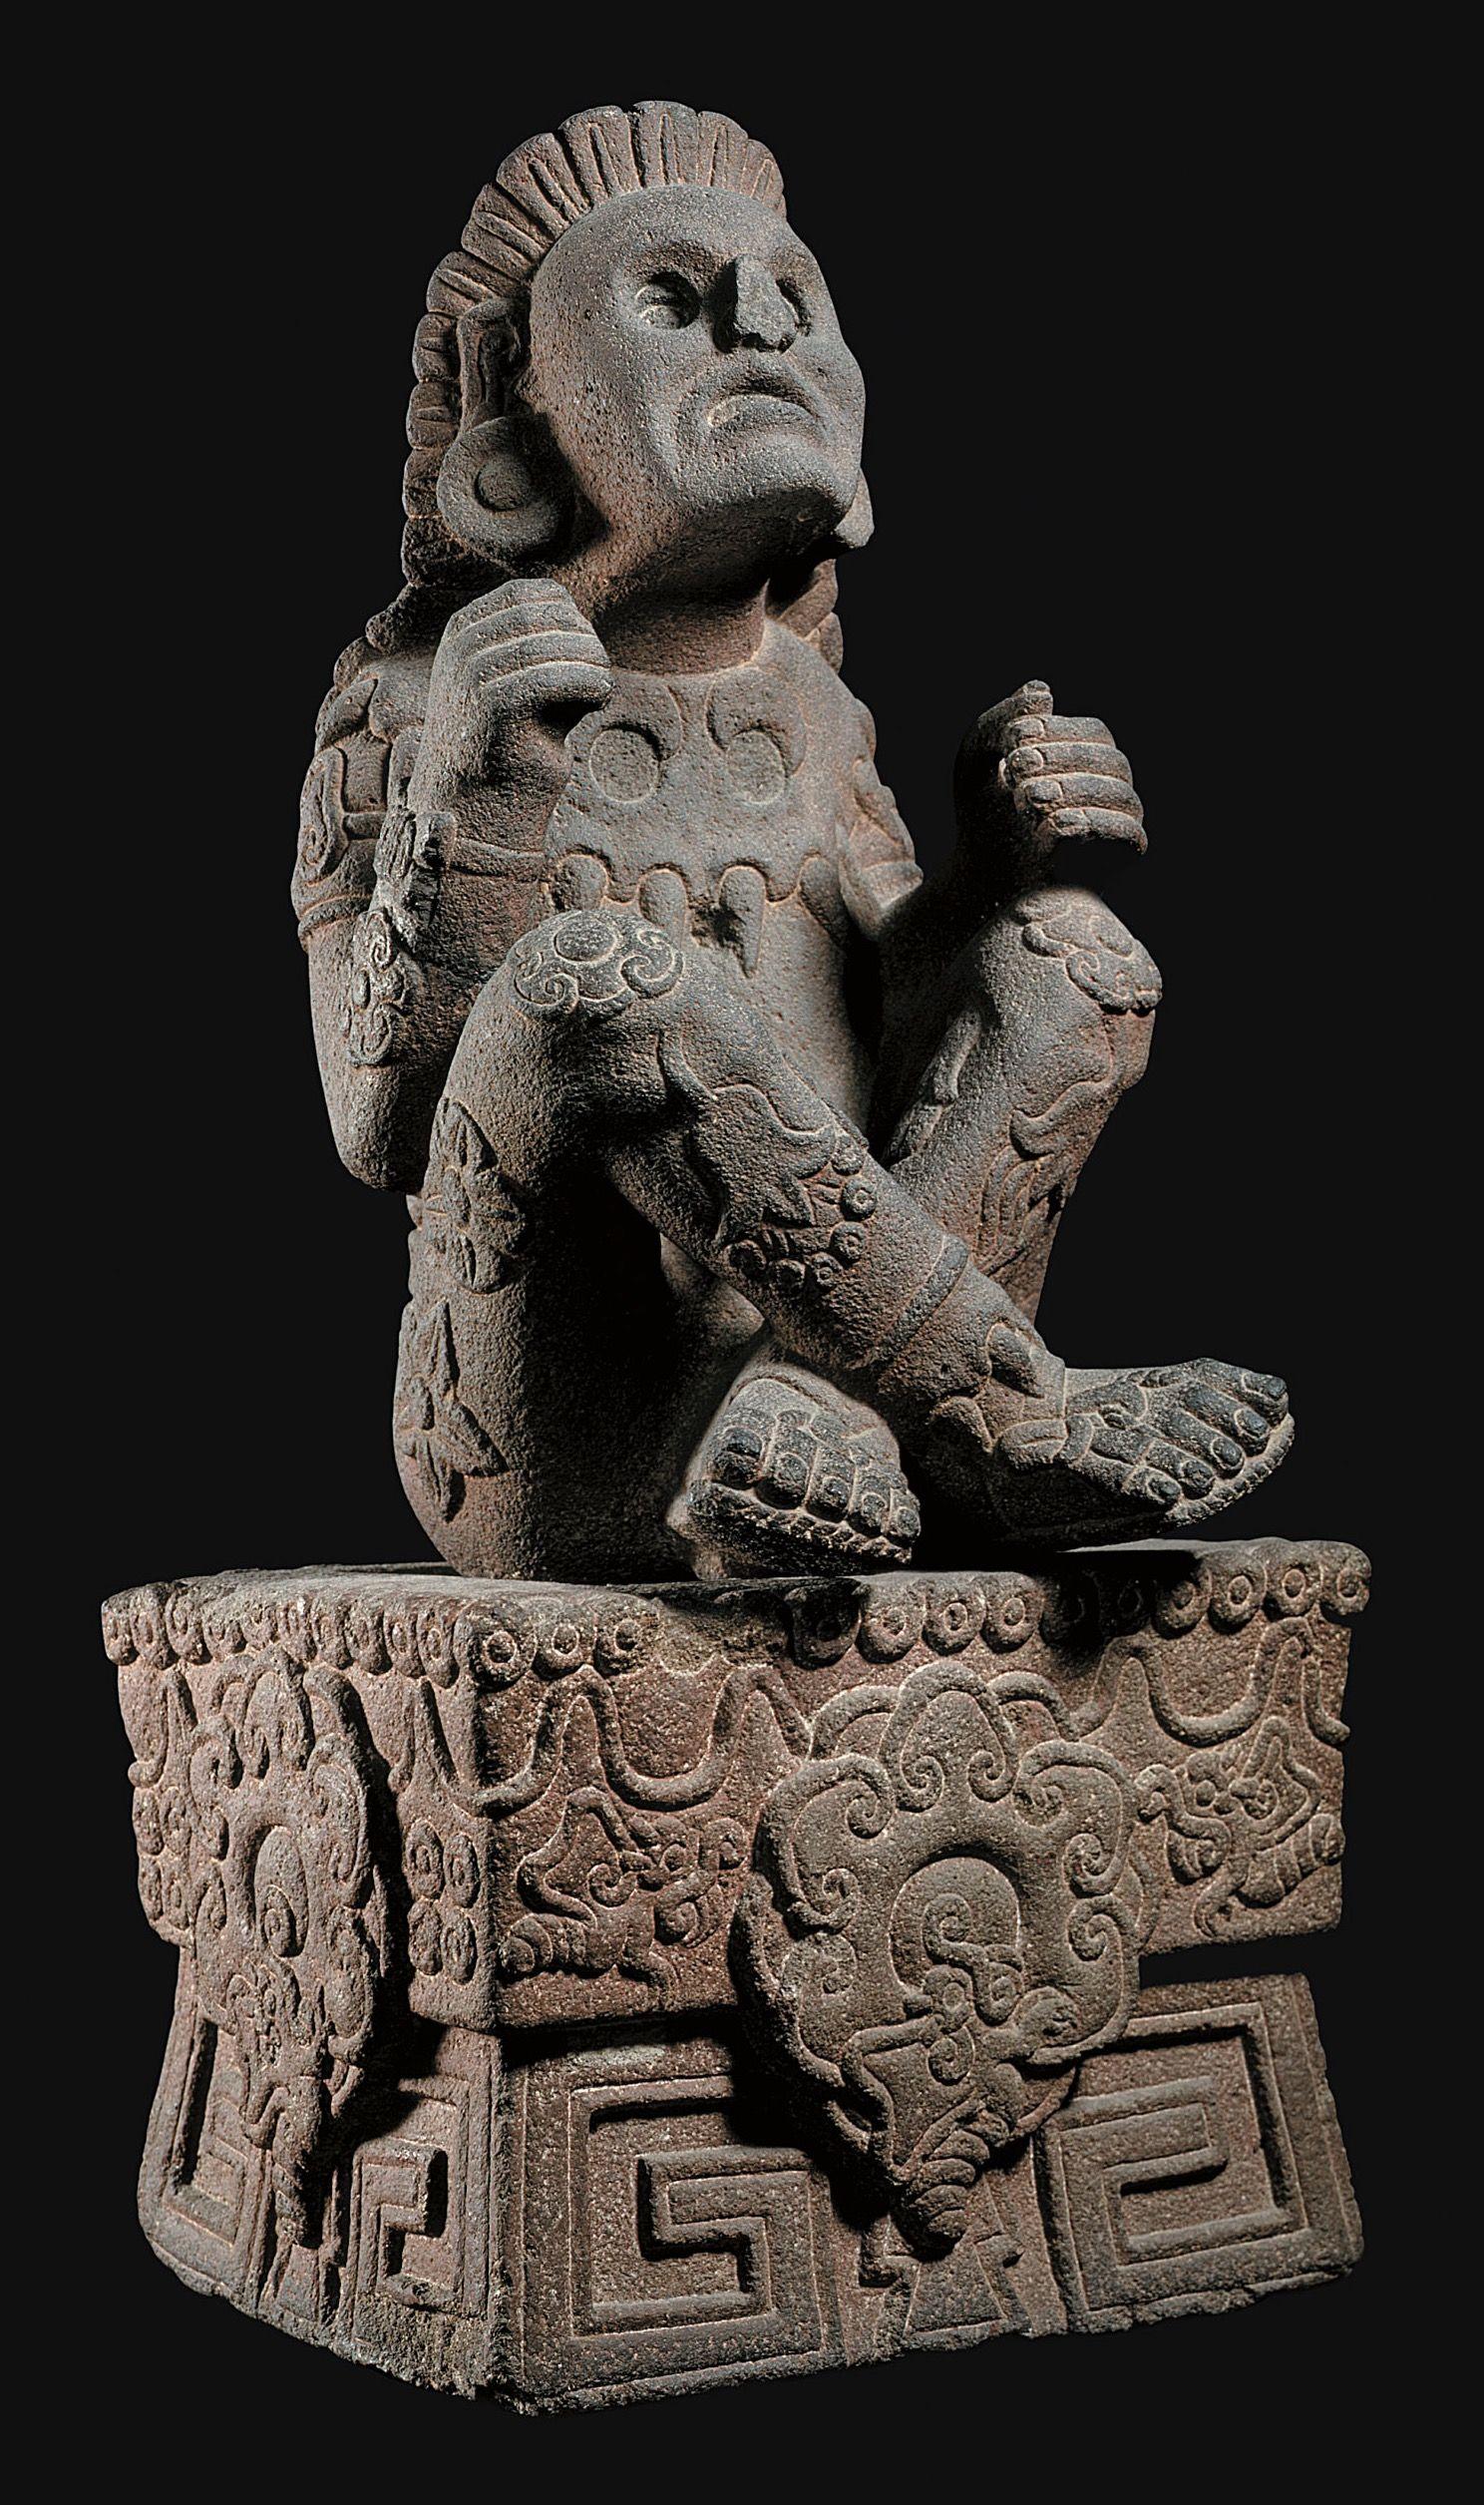 Xochipilli - Aztec god of flowers, music, art. | Arts of ...